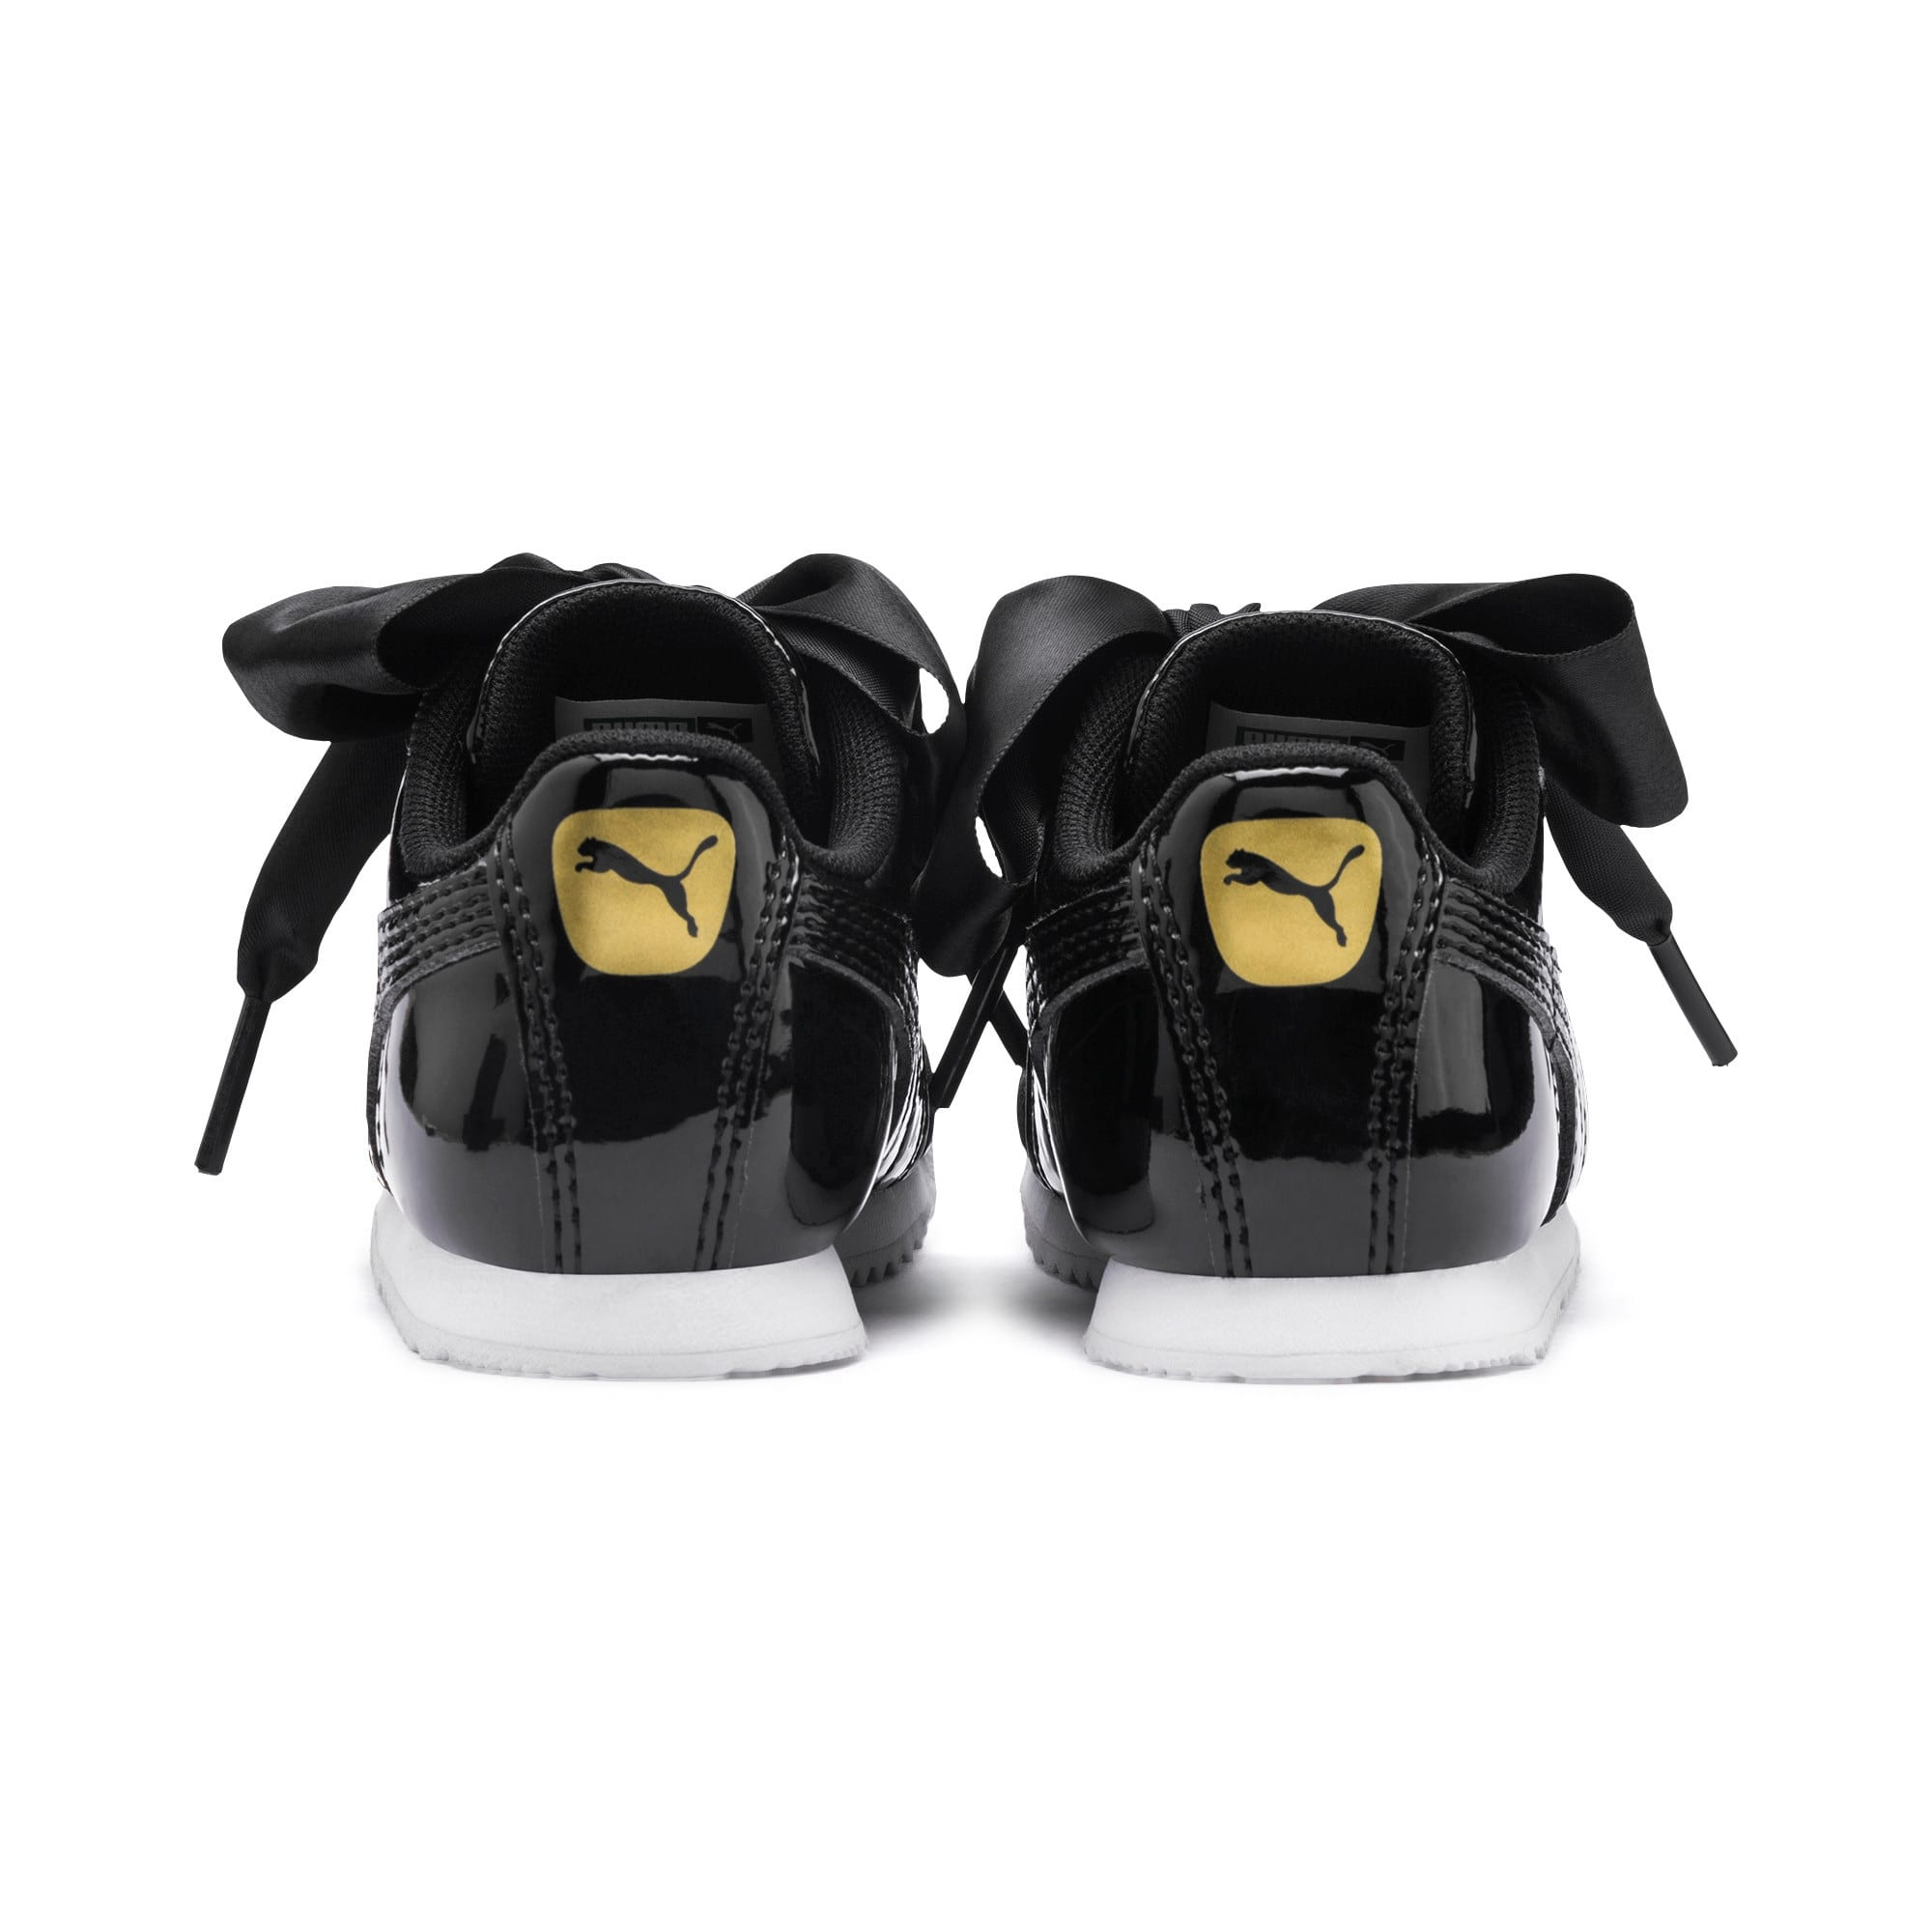 Thumbnail 3 of Roma Heart Patent Toddler Shoes, Puma Black, medium